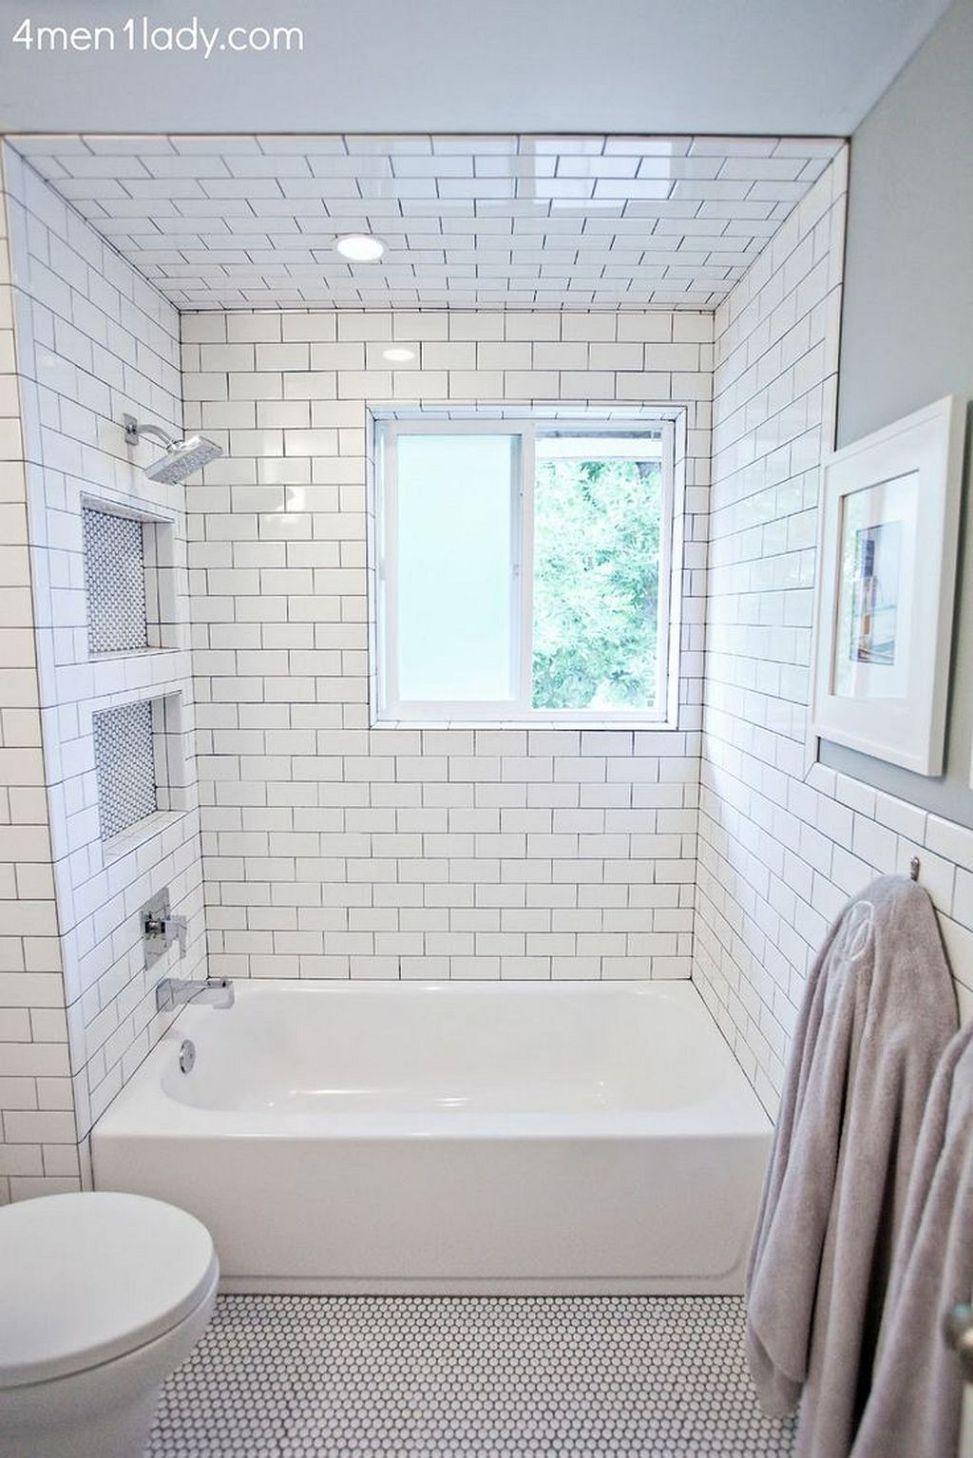 Bathroom Tub Shower Bathtub Shower Combo Bathtubs For Small Bathrooms Shower Tub Combination